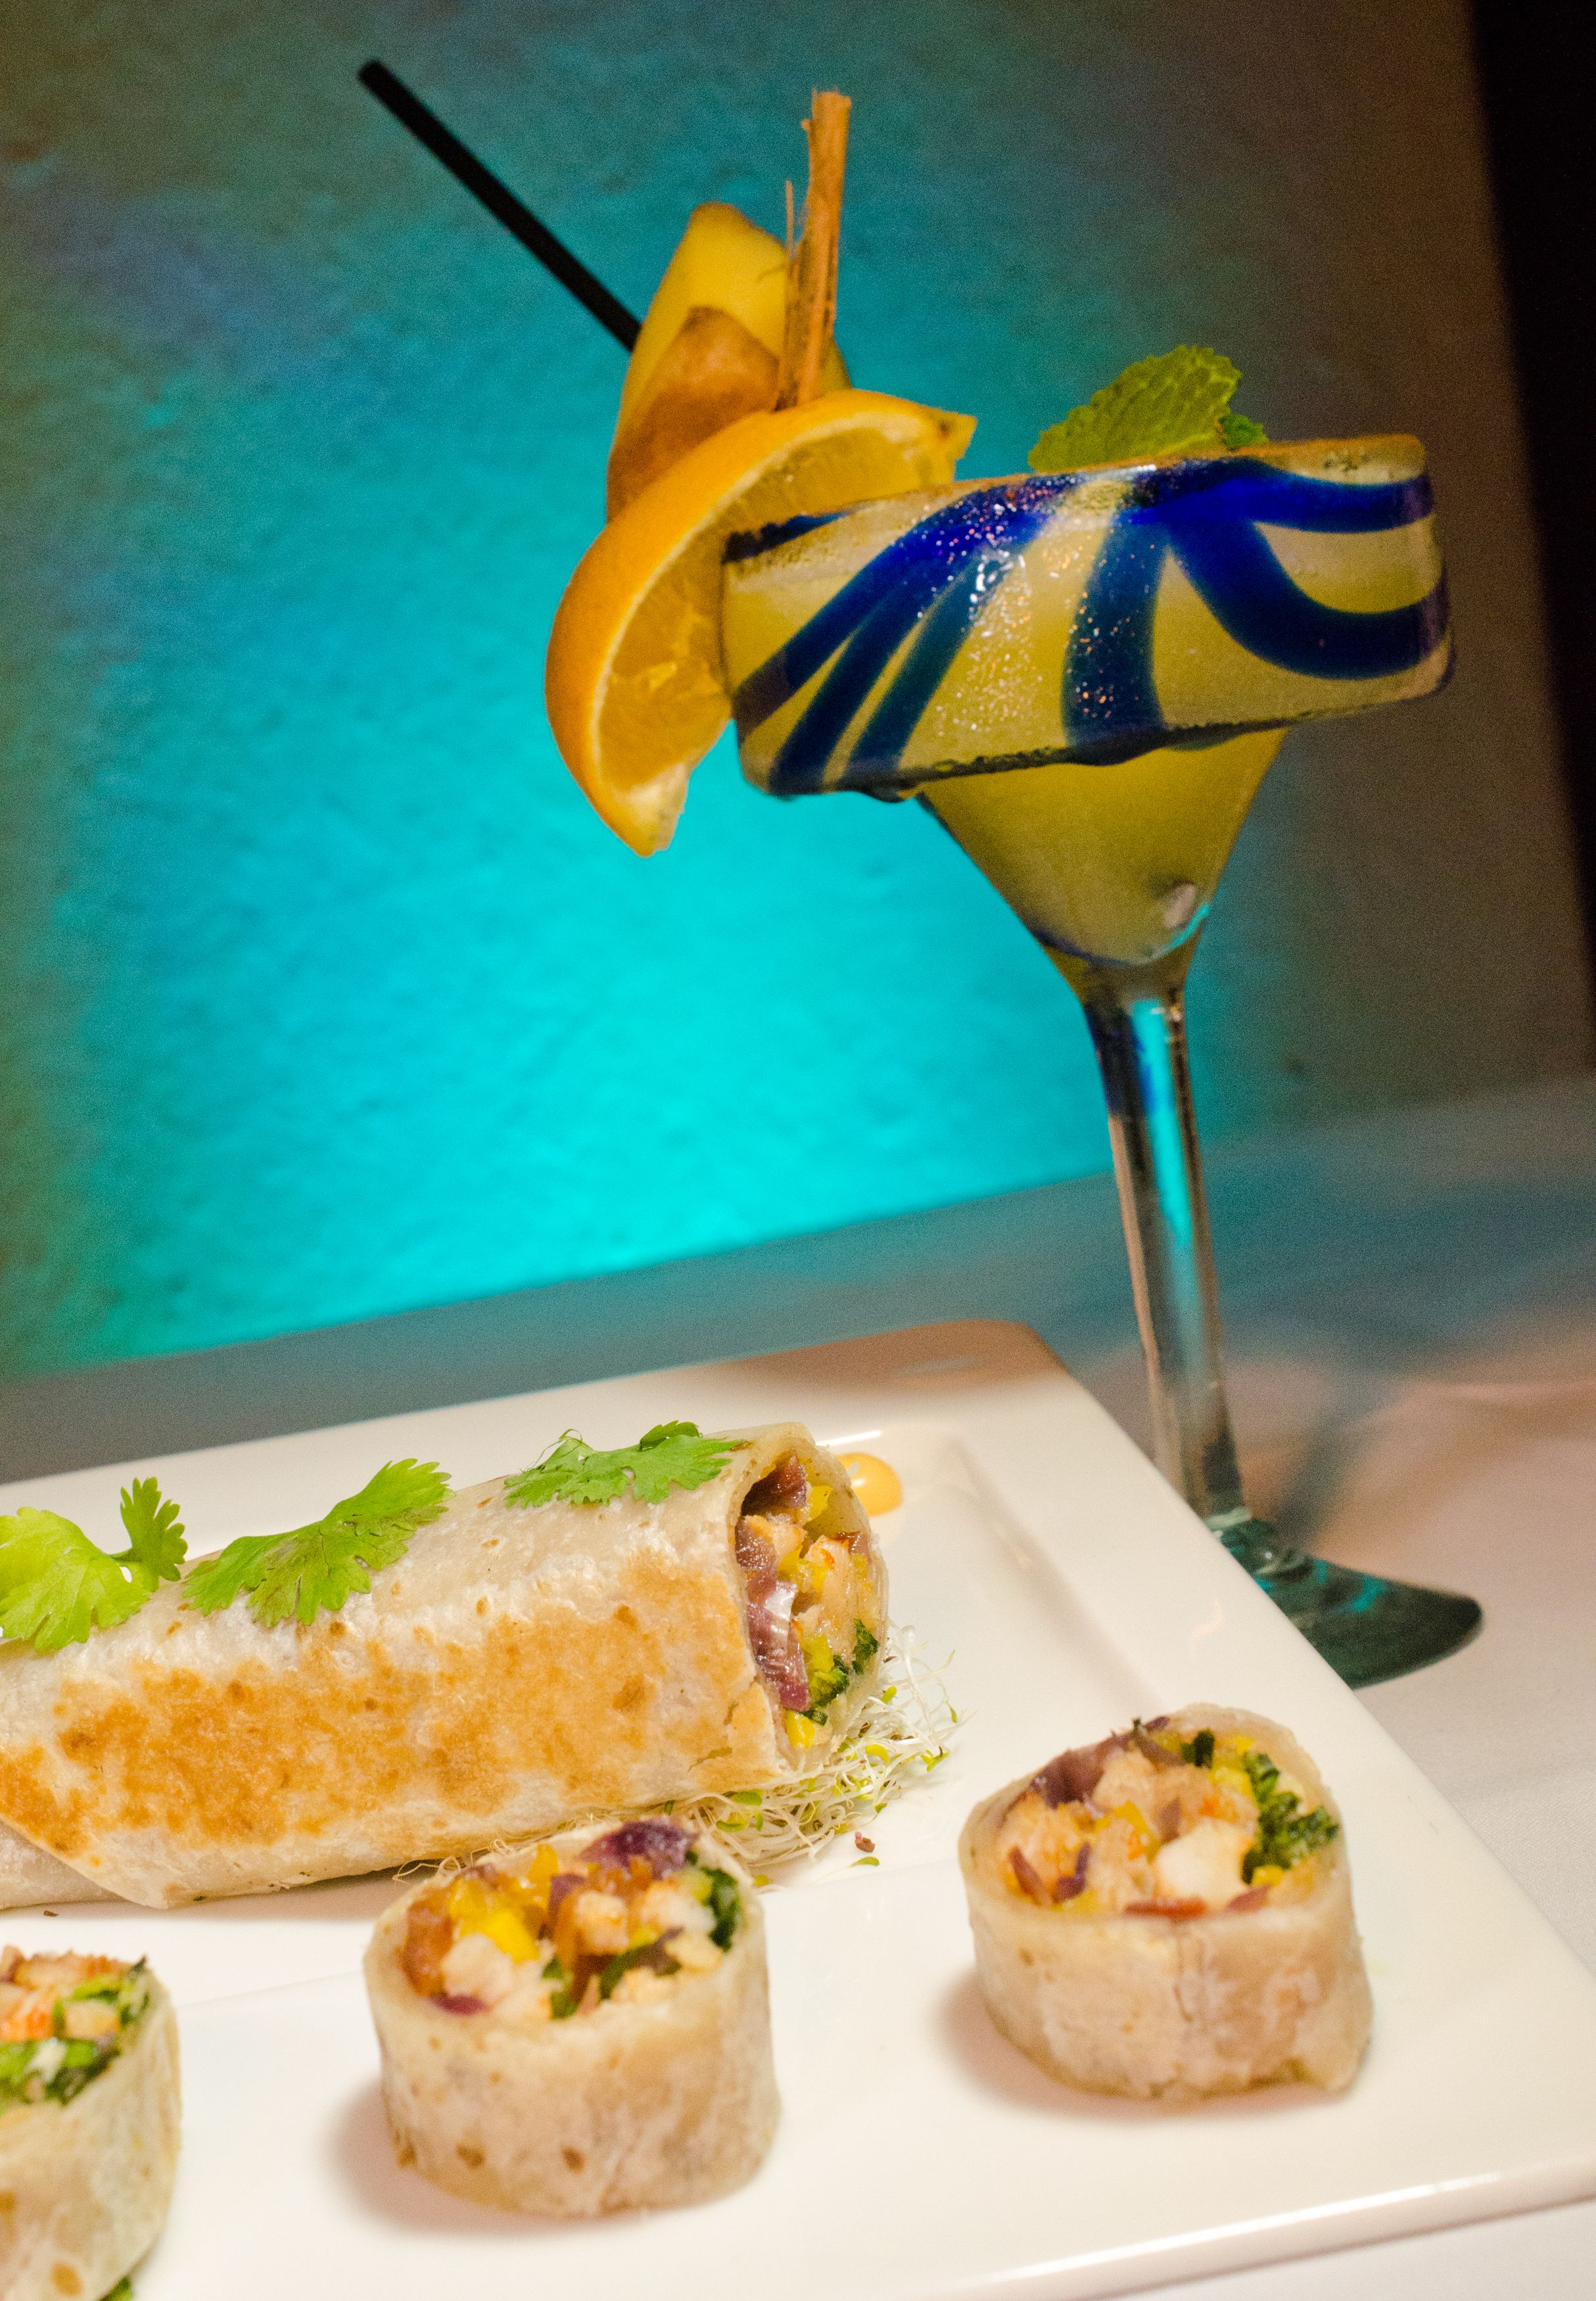 Delicious Margarita At Tequila Fusion Restaurant Me Cabo